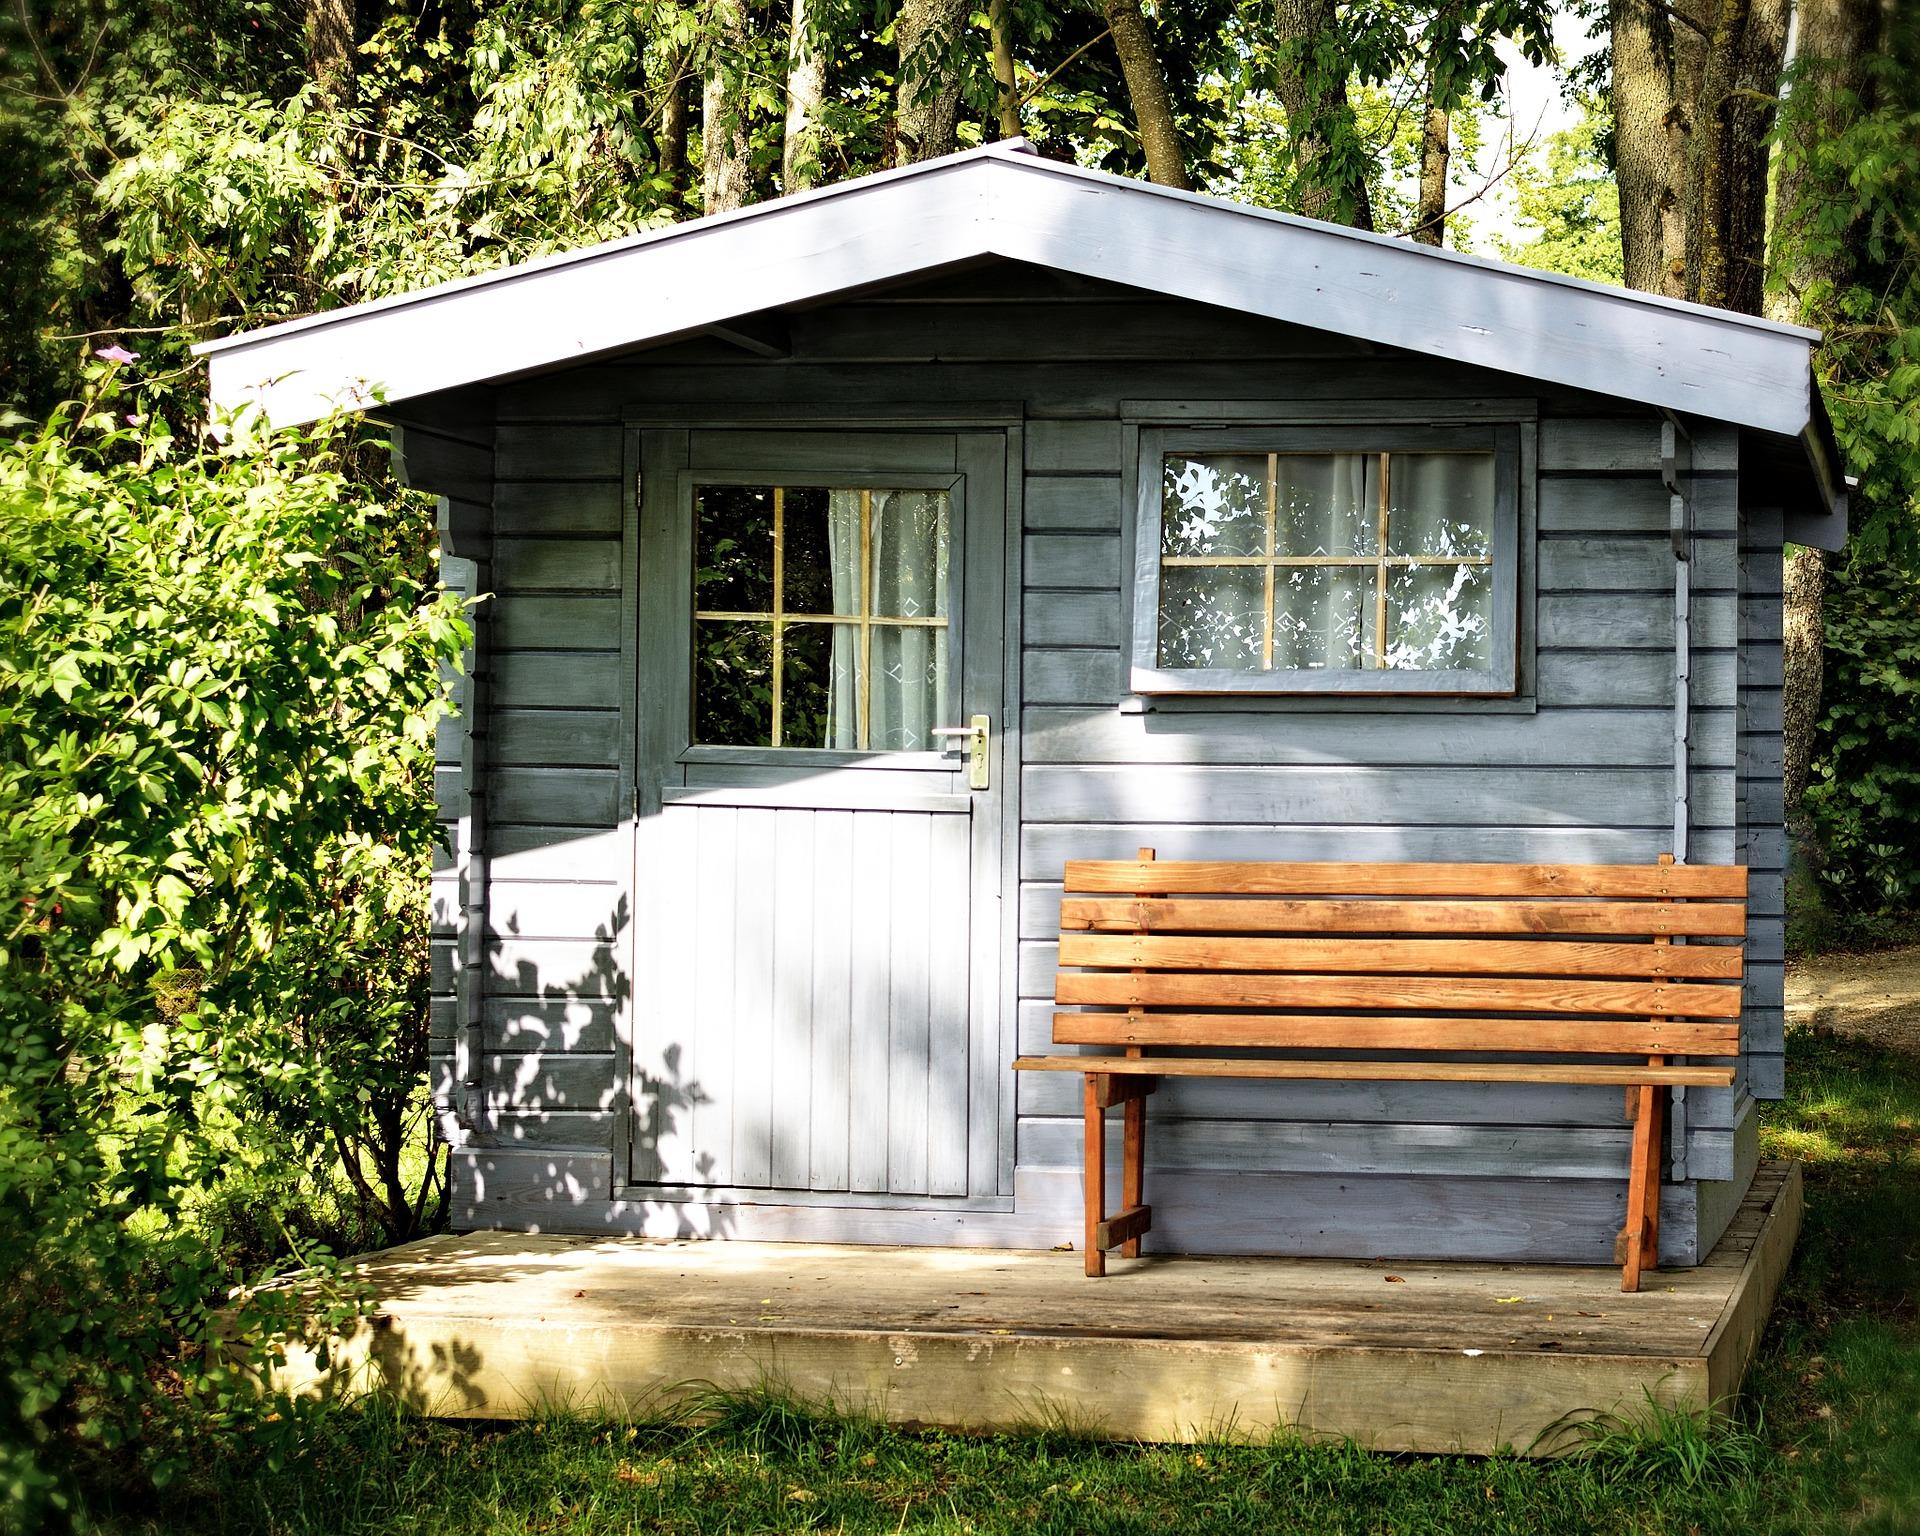 Ein Gartenhaus aus Holz gibt emotionale Wärme. Foto Antranias/5178 images/Pixabay